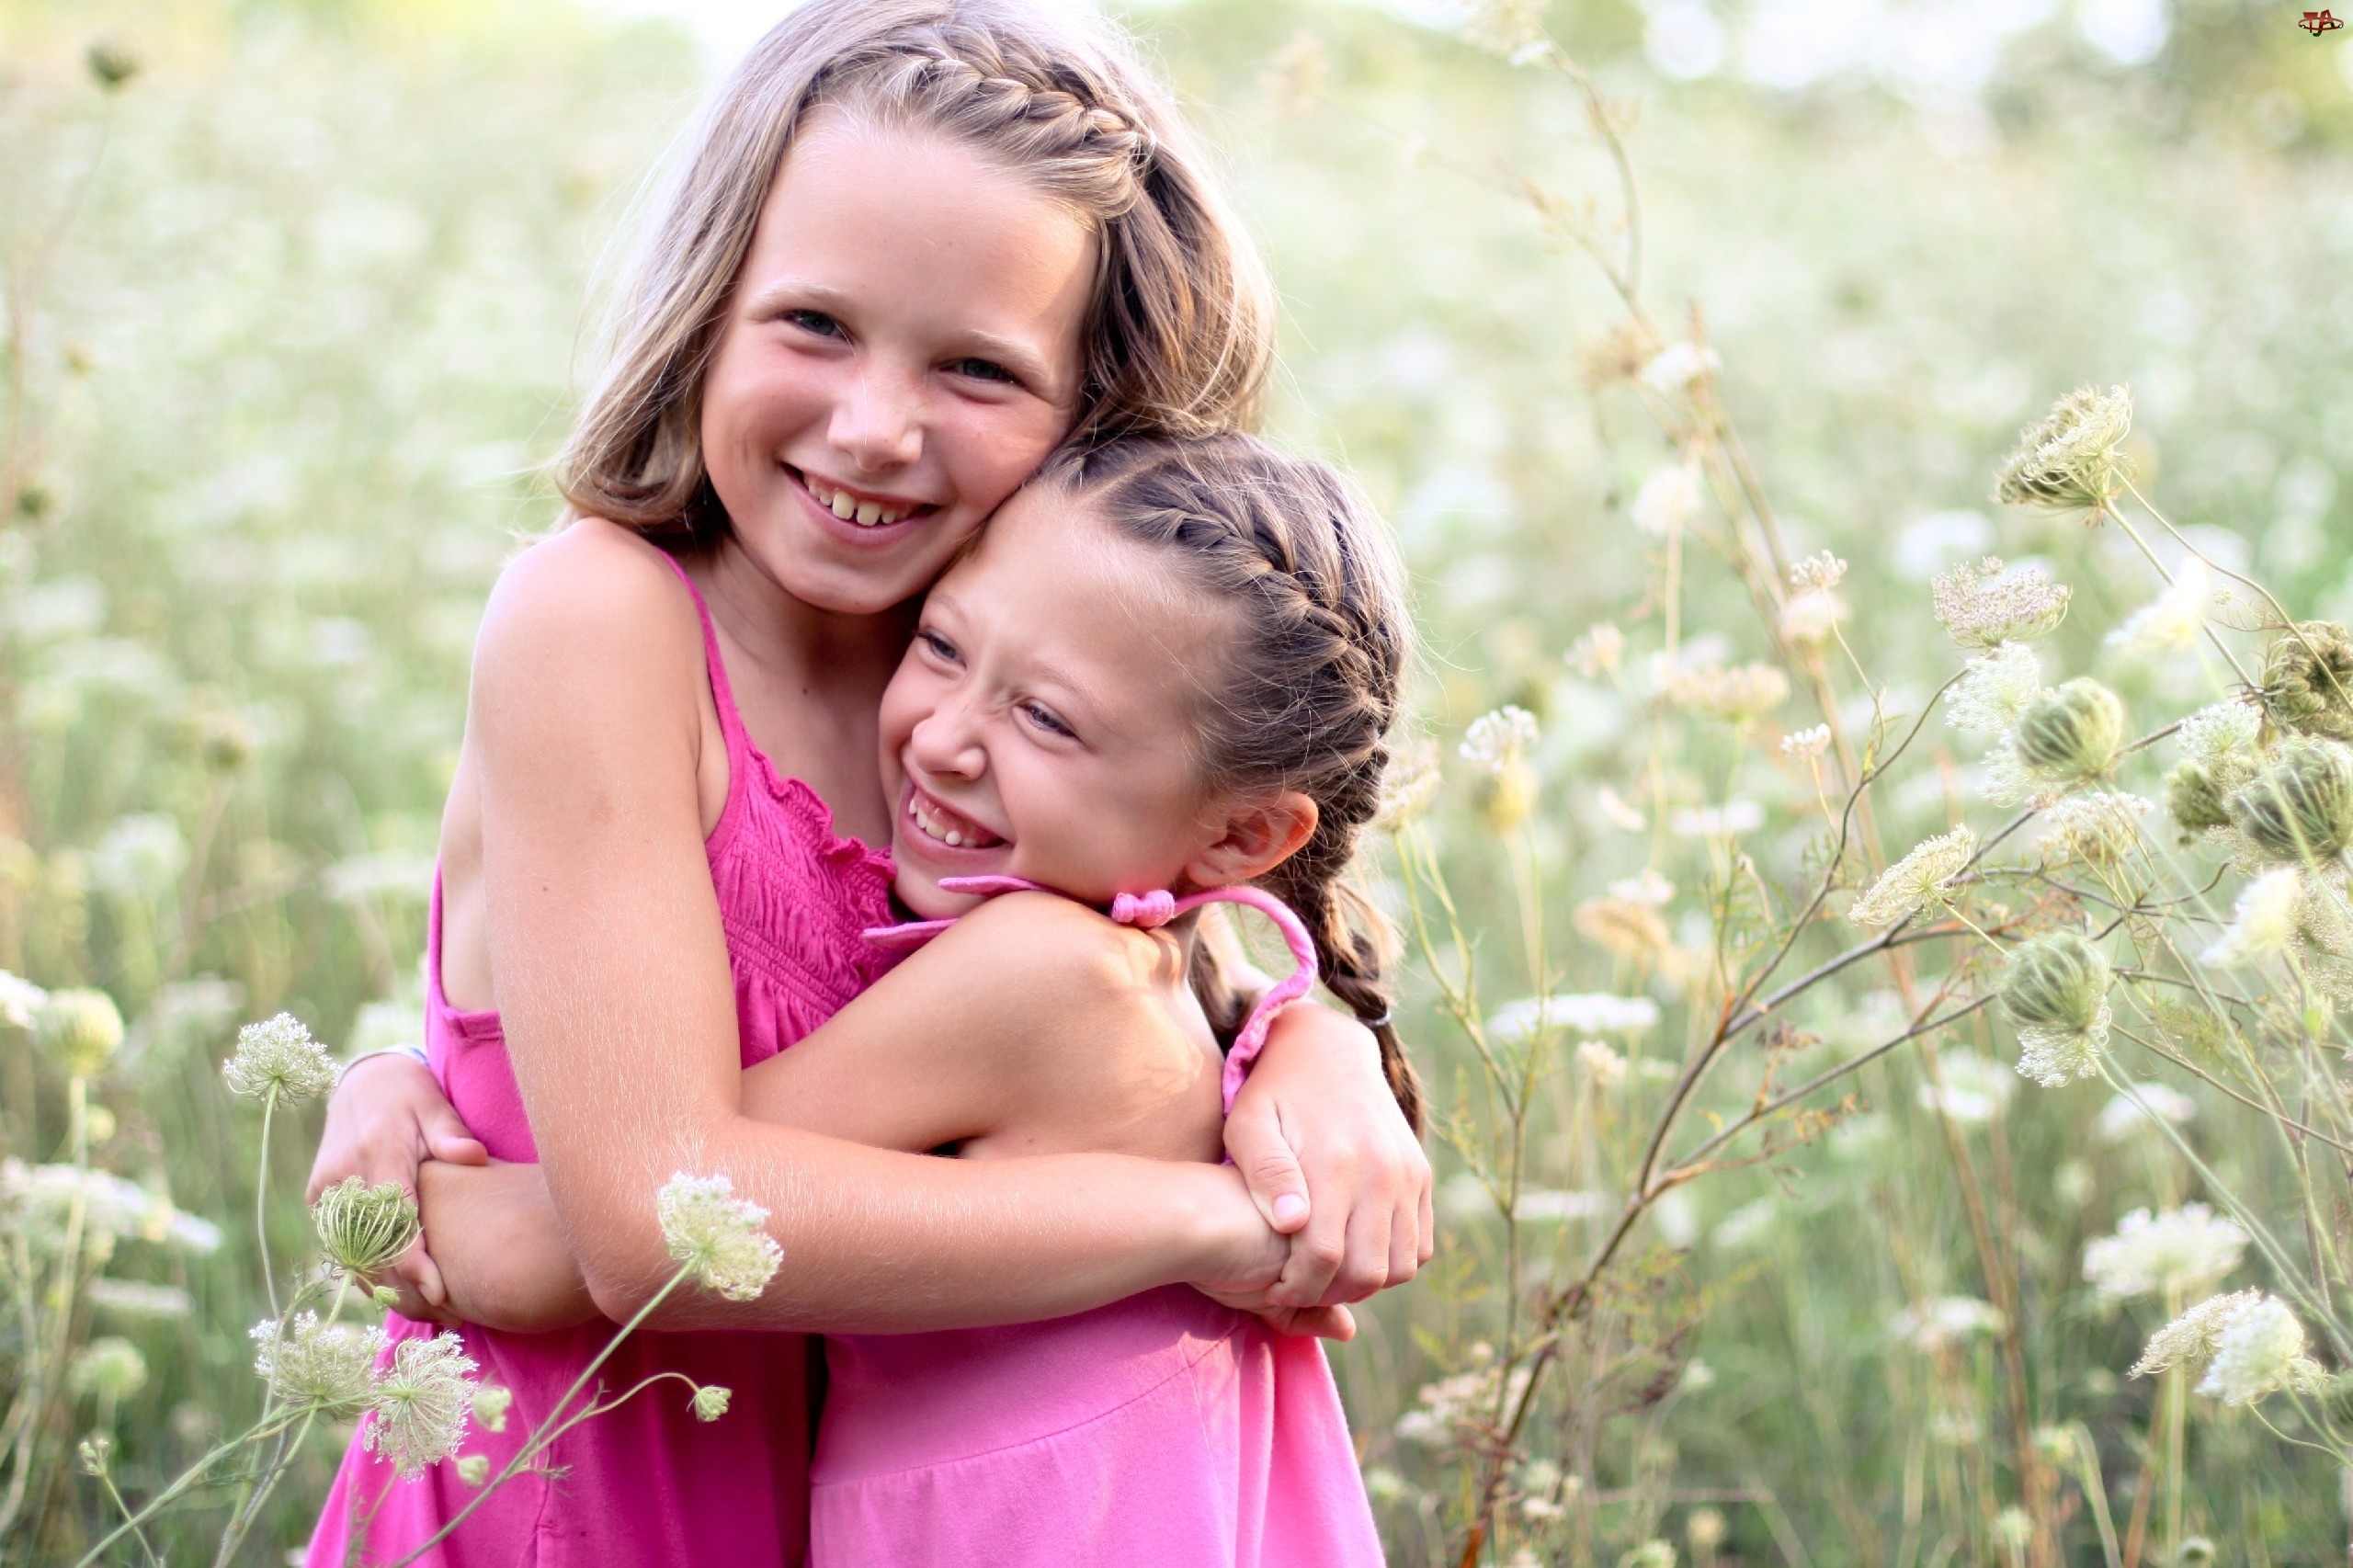 Мама обнимает ребенка: картинки и фото. - Depositphotos